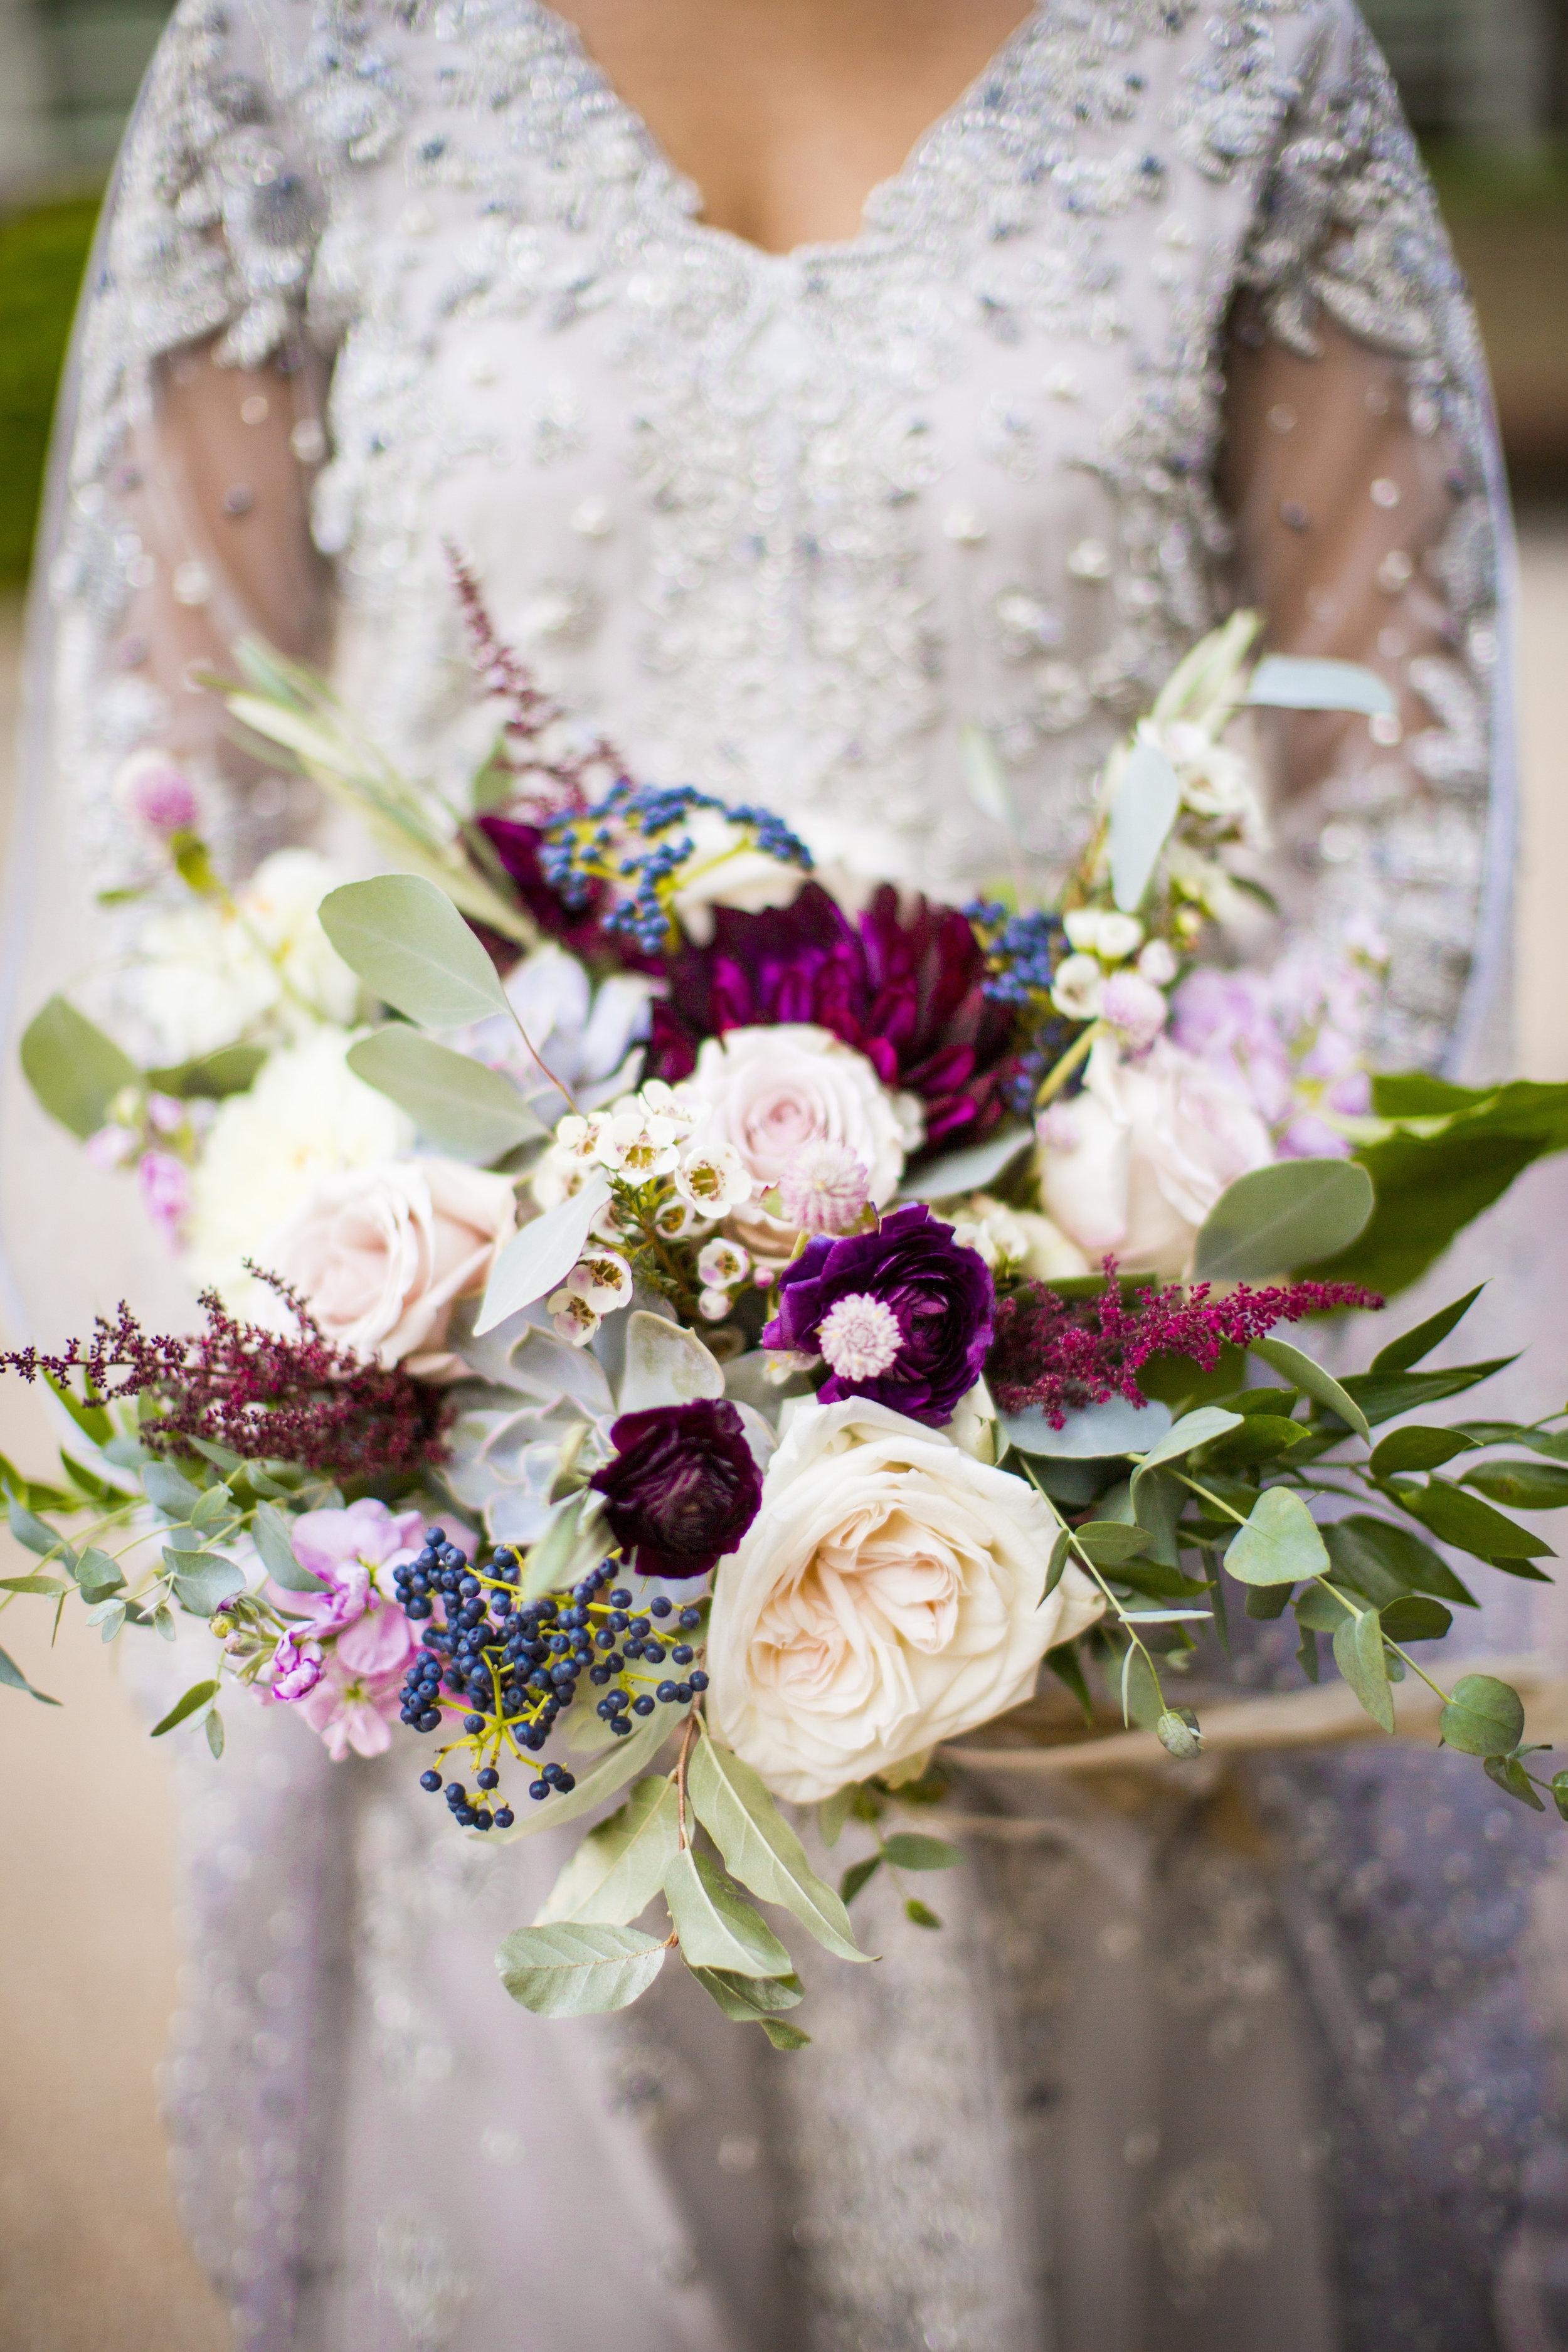 corradetti-glassblowing-studio-wedding-maryland-wedding-coordinator-steel-cut-floral-co